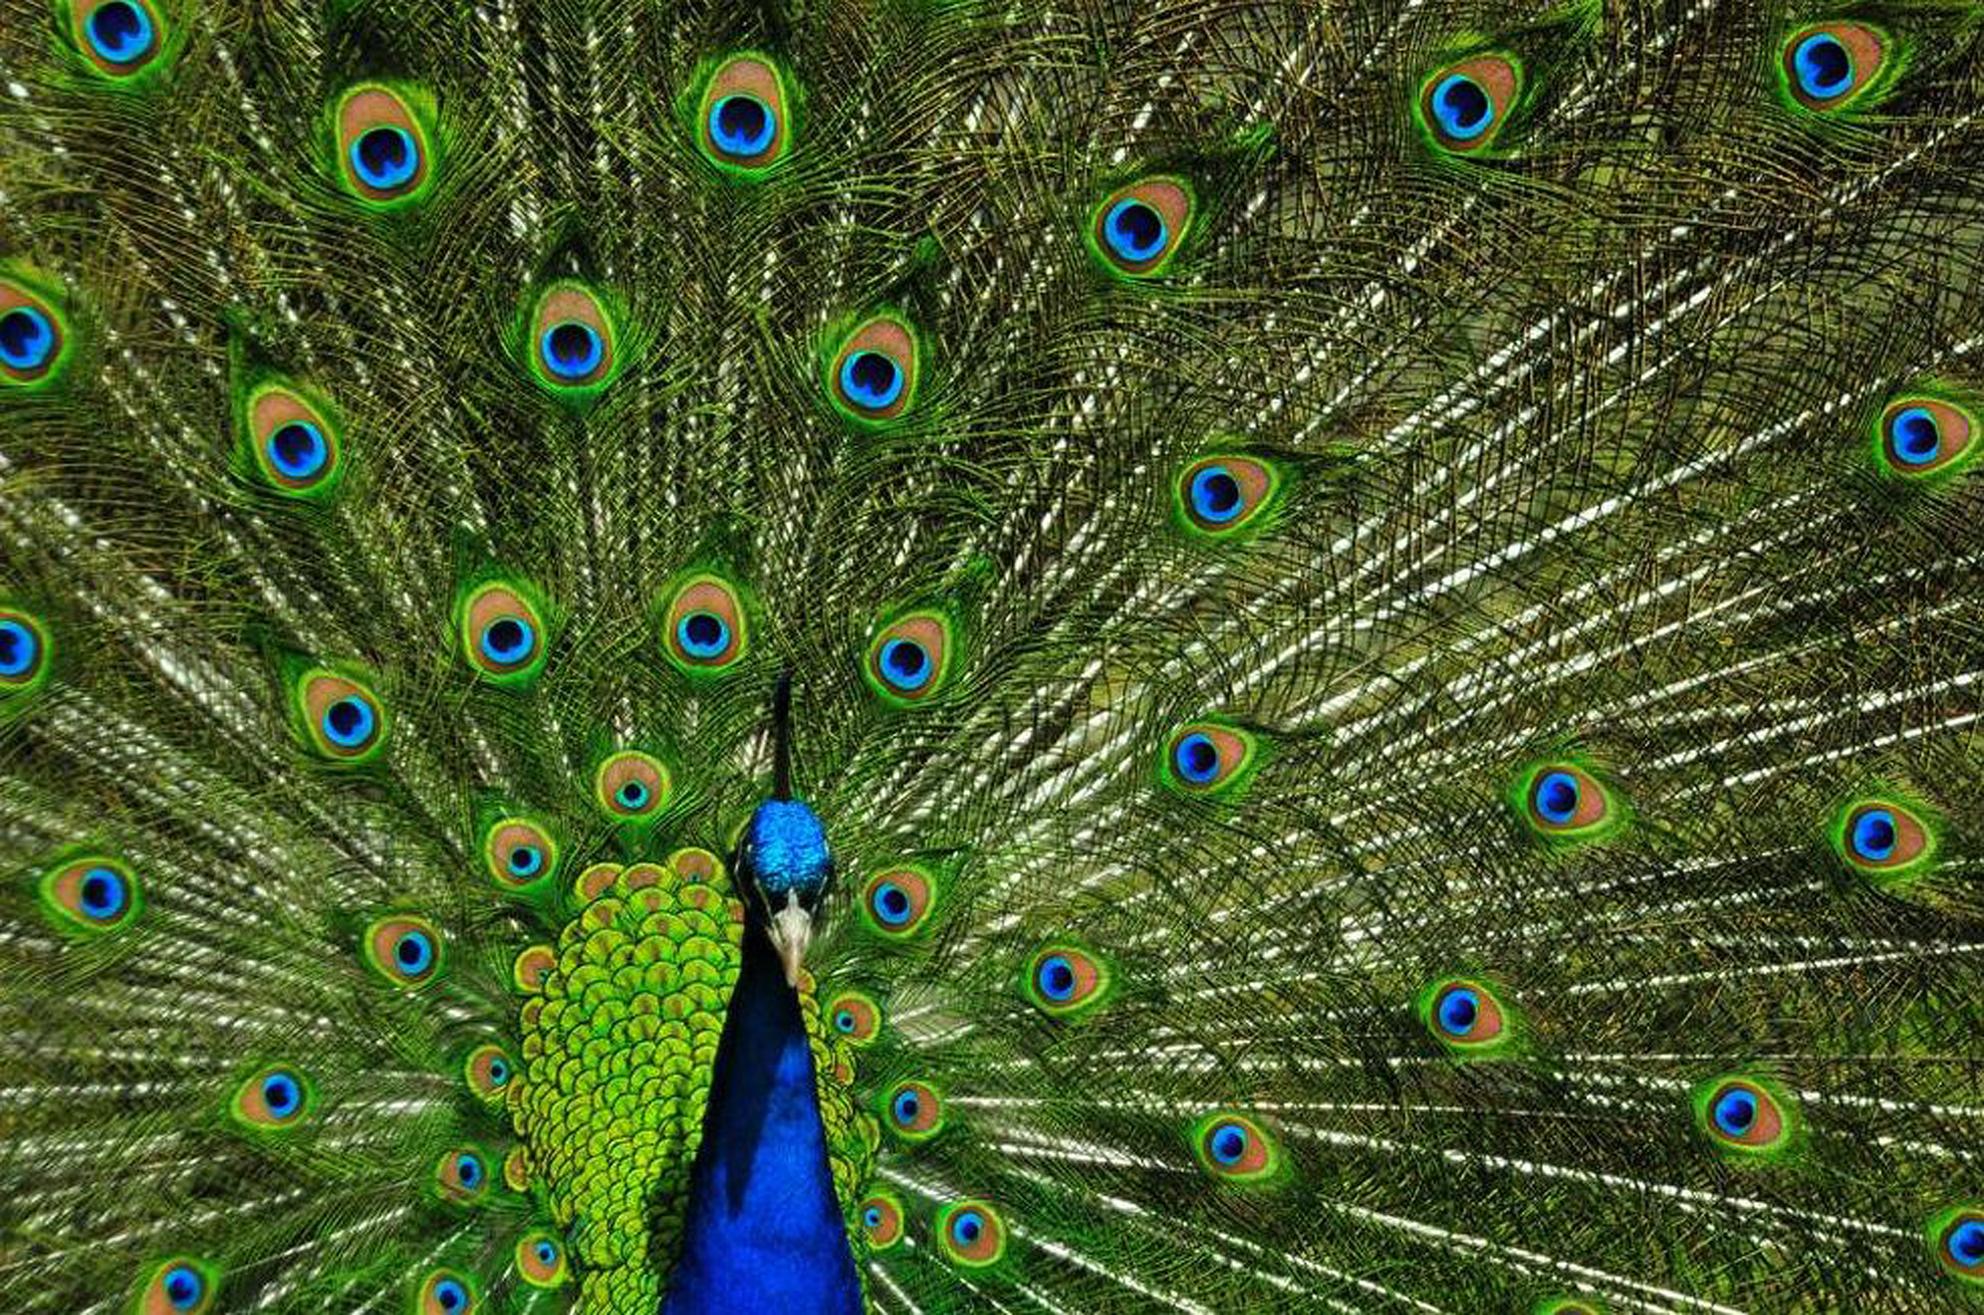 PeacockFanTail